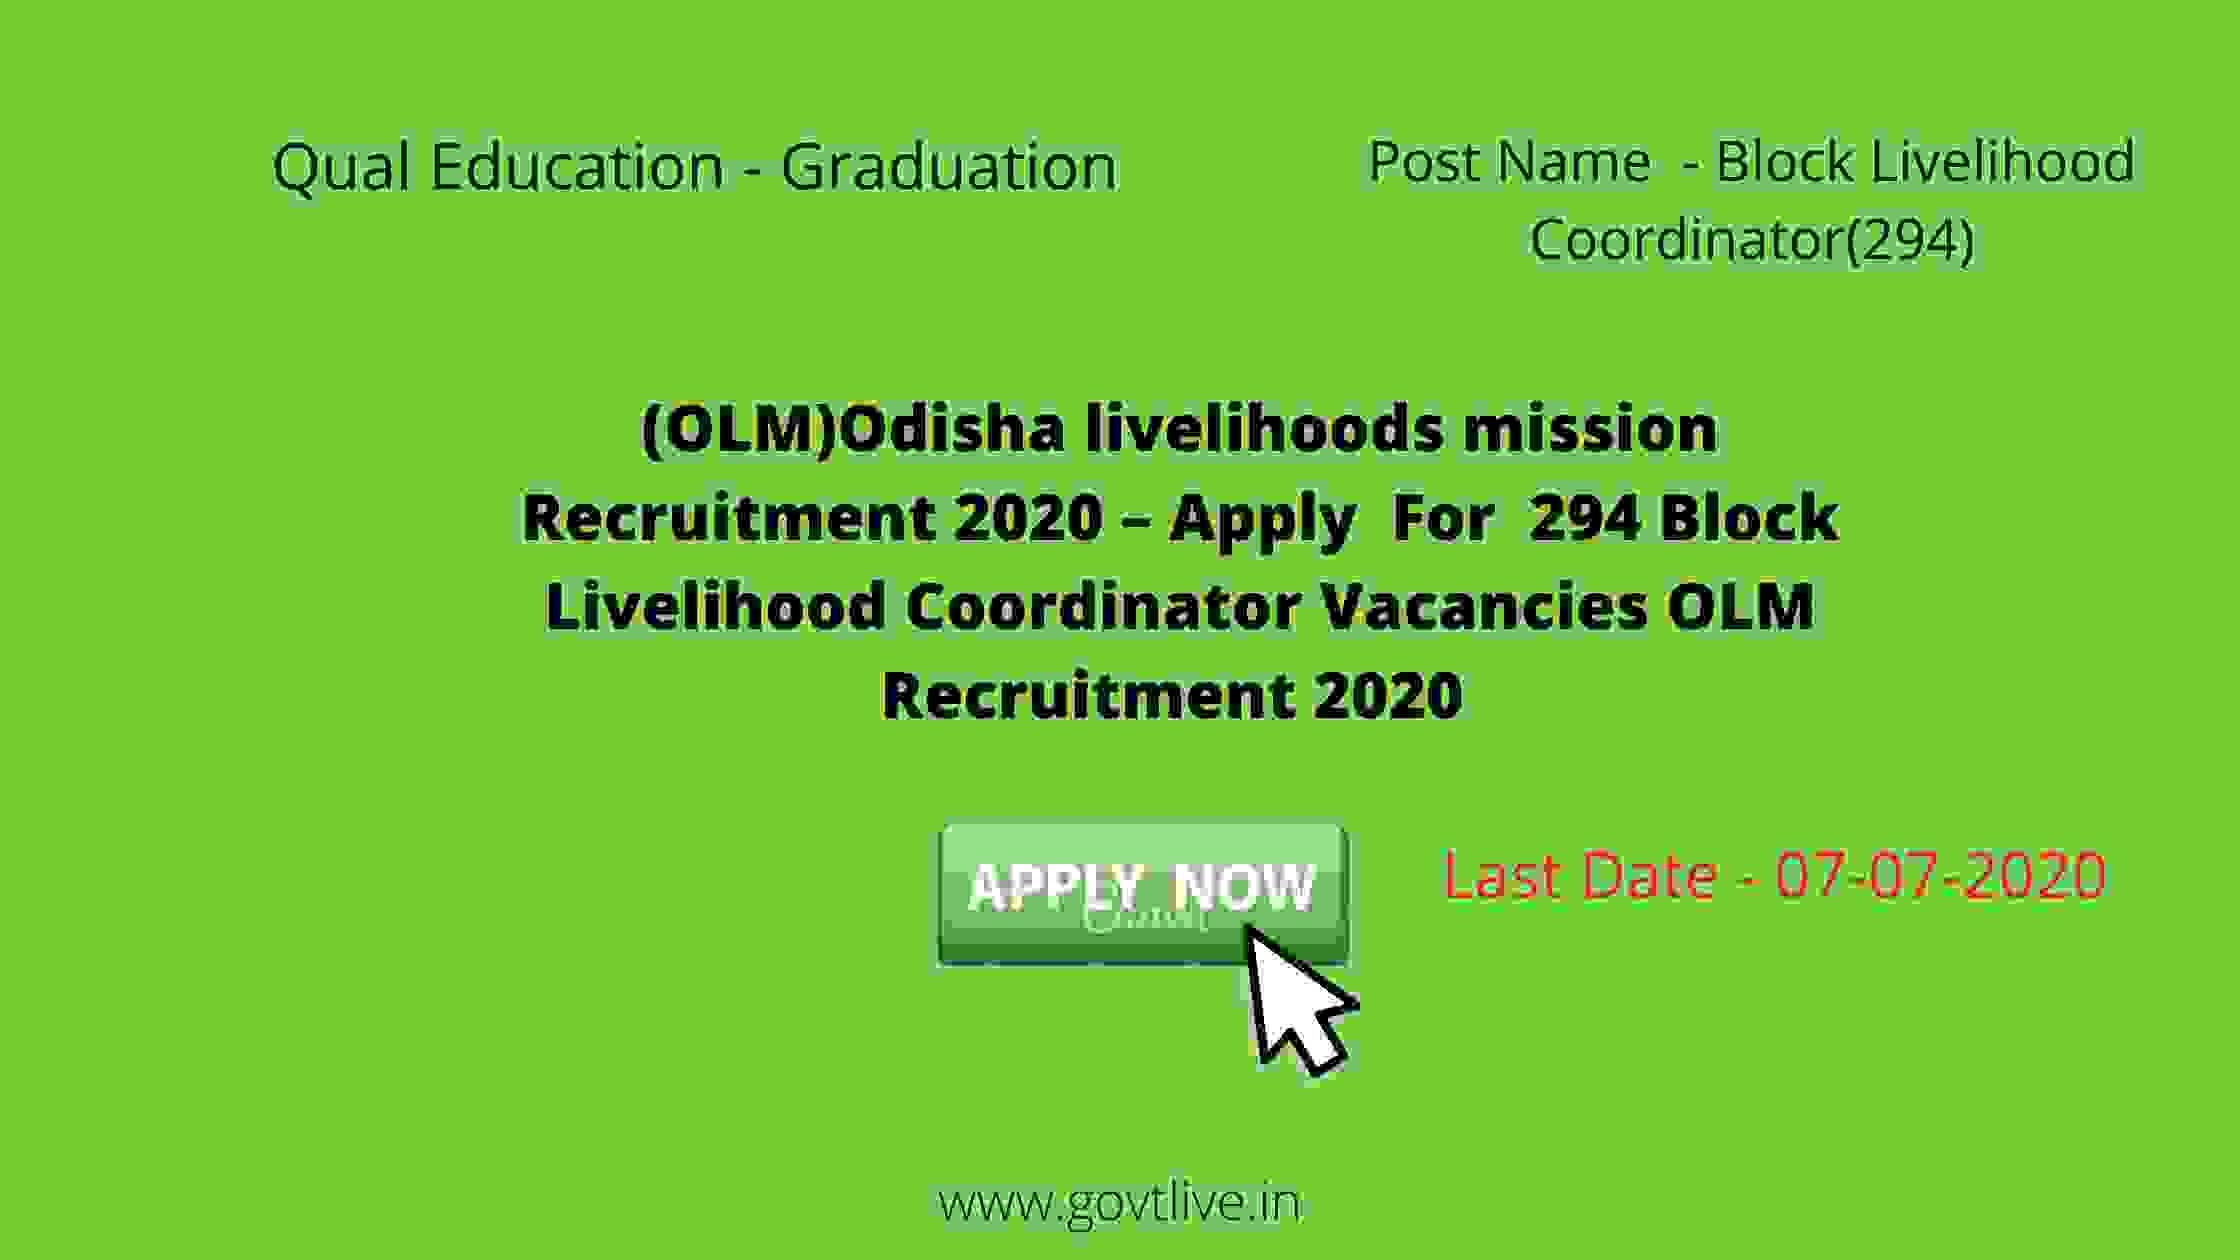 (OLM)Odisha livelihoods mission Recruitment 2020 – Apply  For  294 Block Livelihood Coordinator Vacancies OLM Recruitment 2020